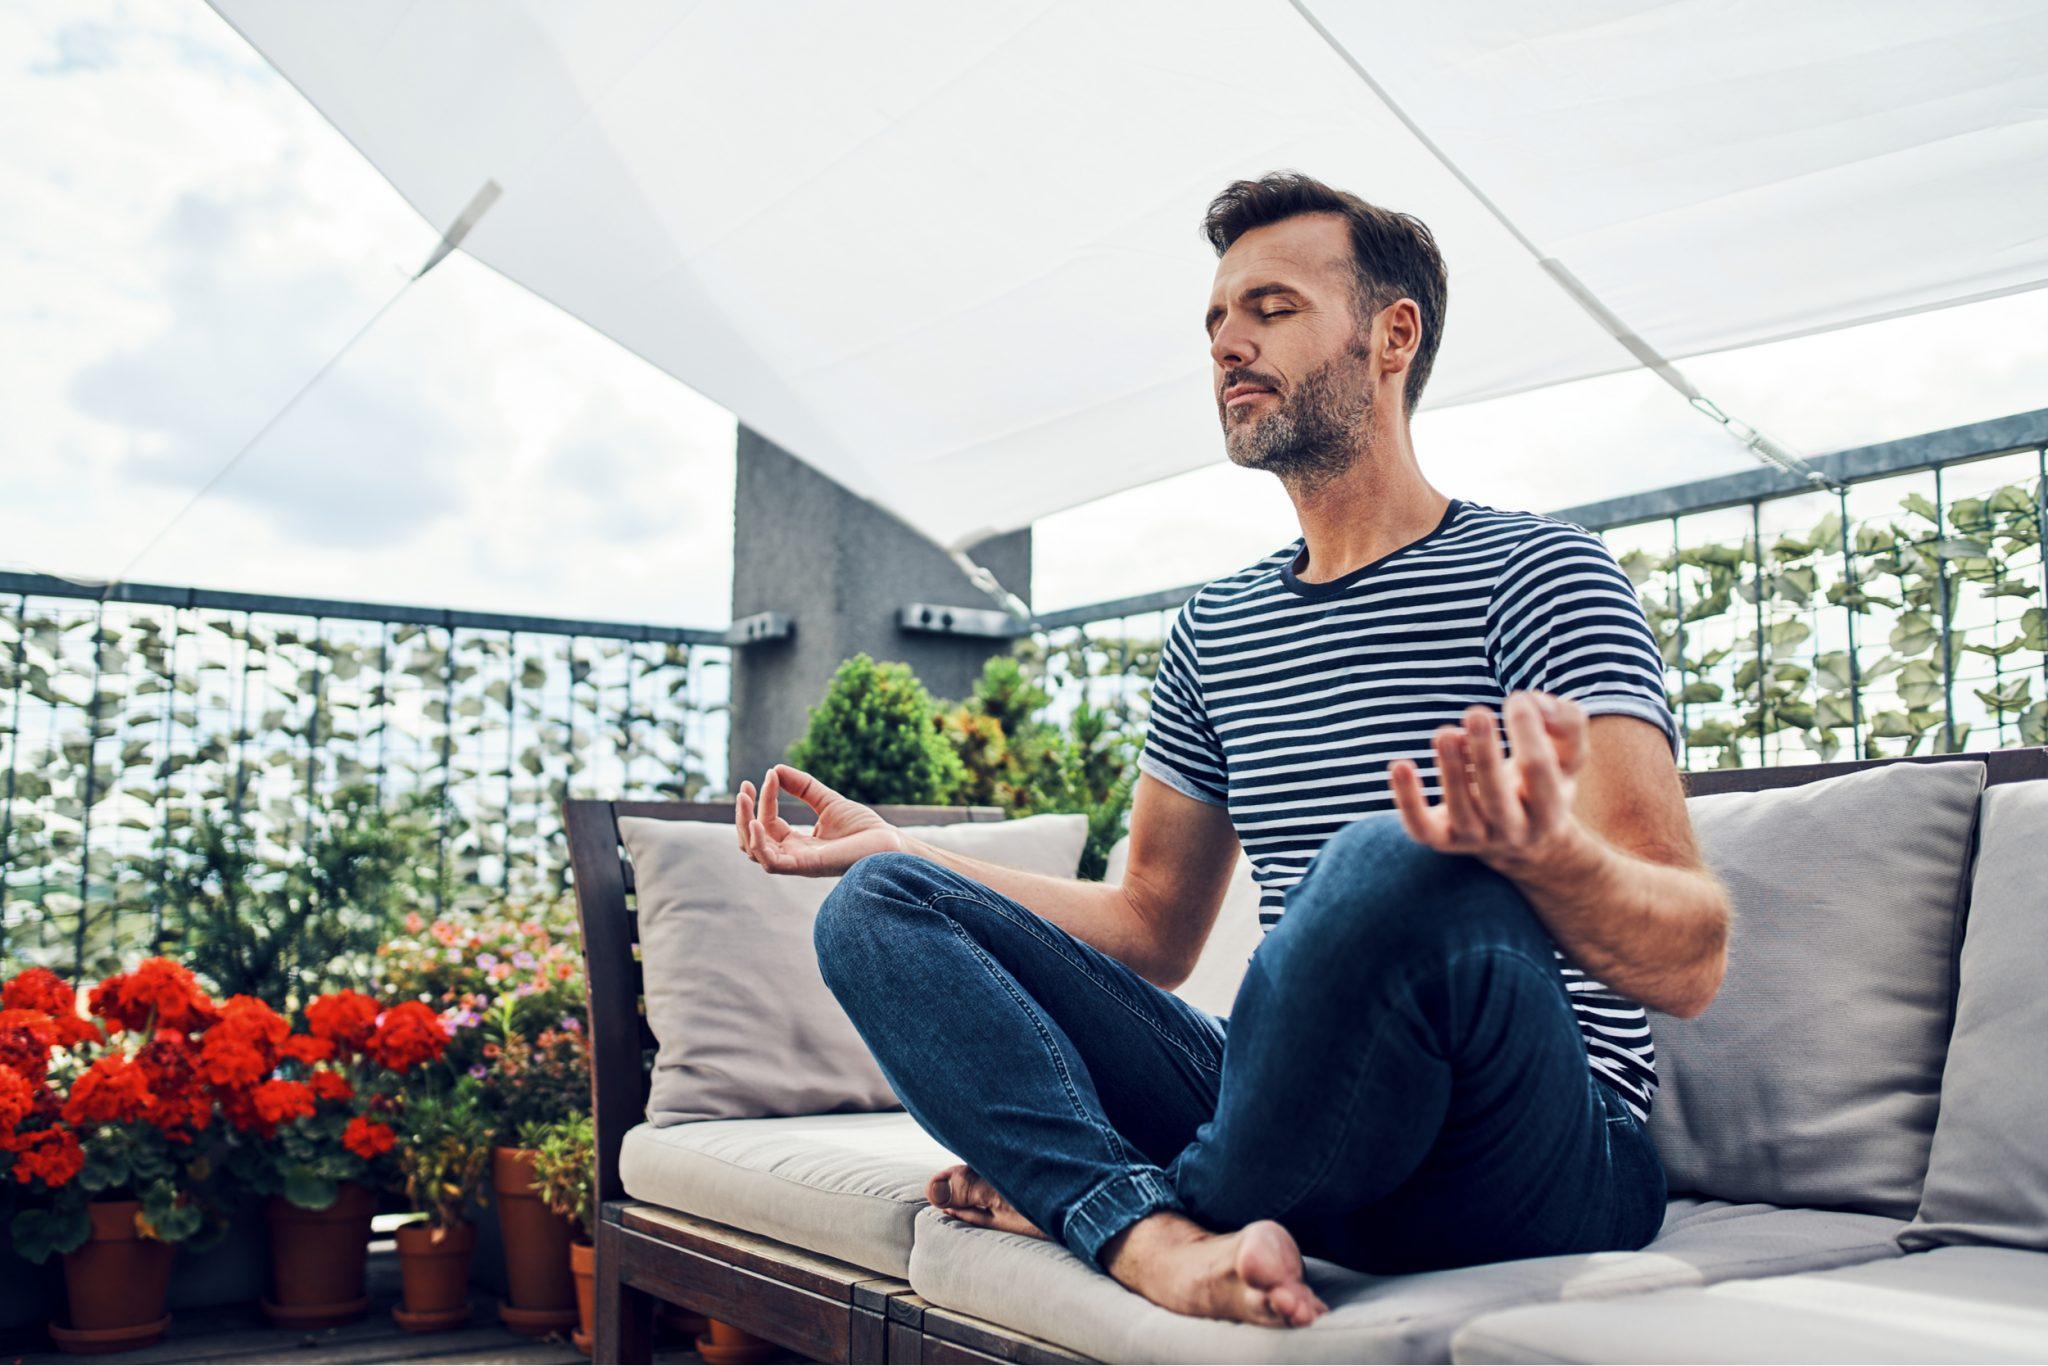 Meditation Space tips